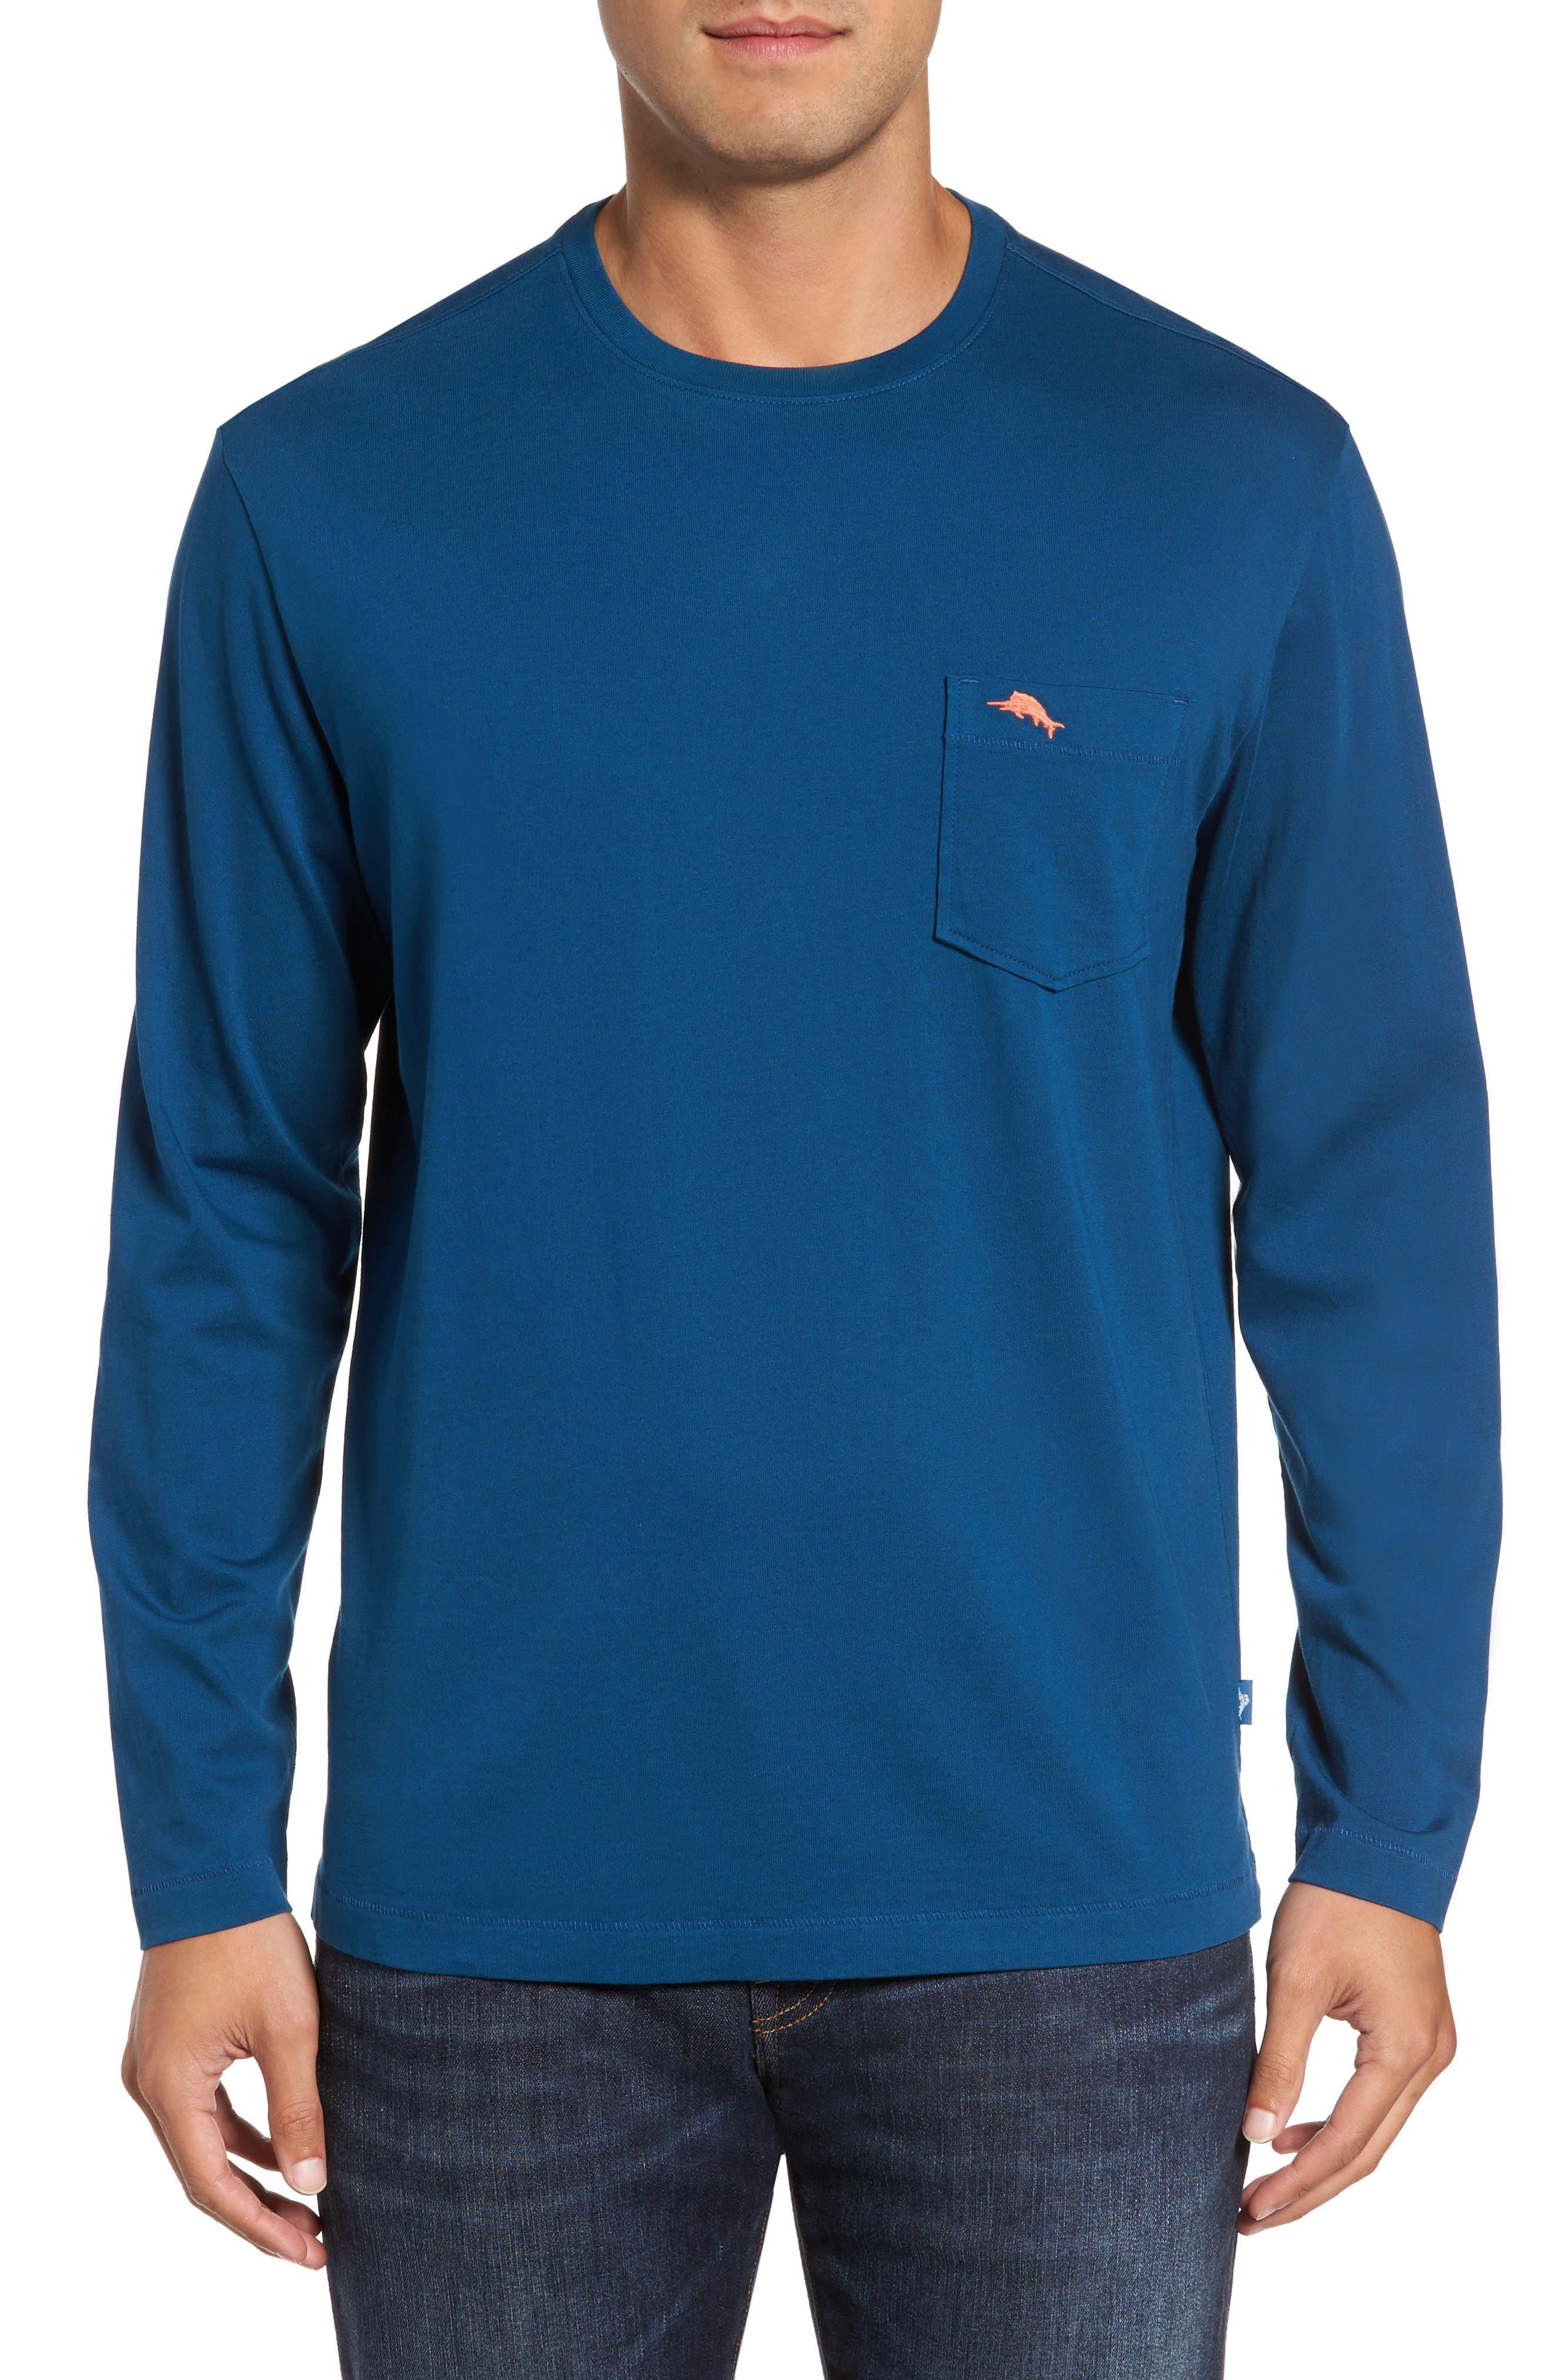 Alternate Image 1 Selected - Tommy Bahama 'Bali Skyline' Long Sleeve Pima Cotton T-Shirt (Big & Tall)